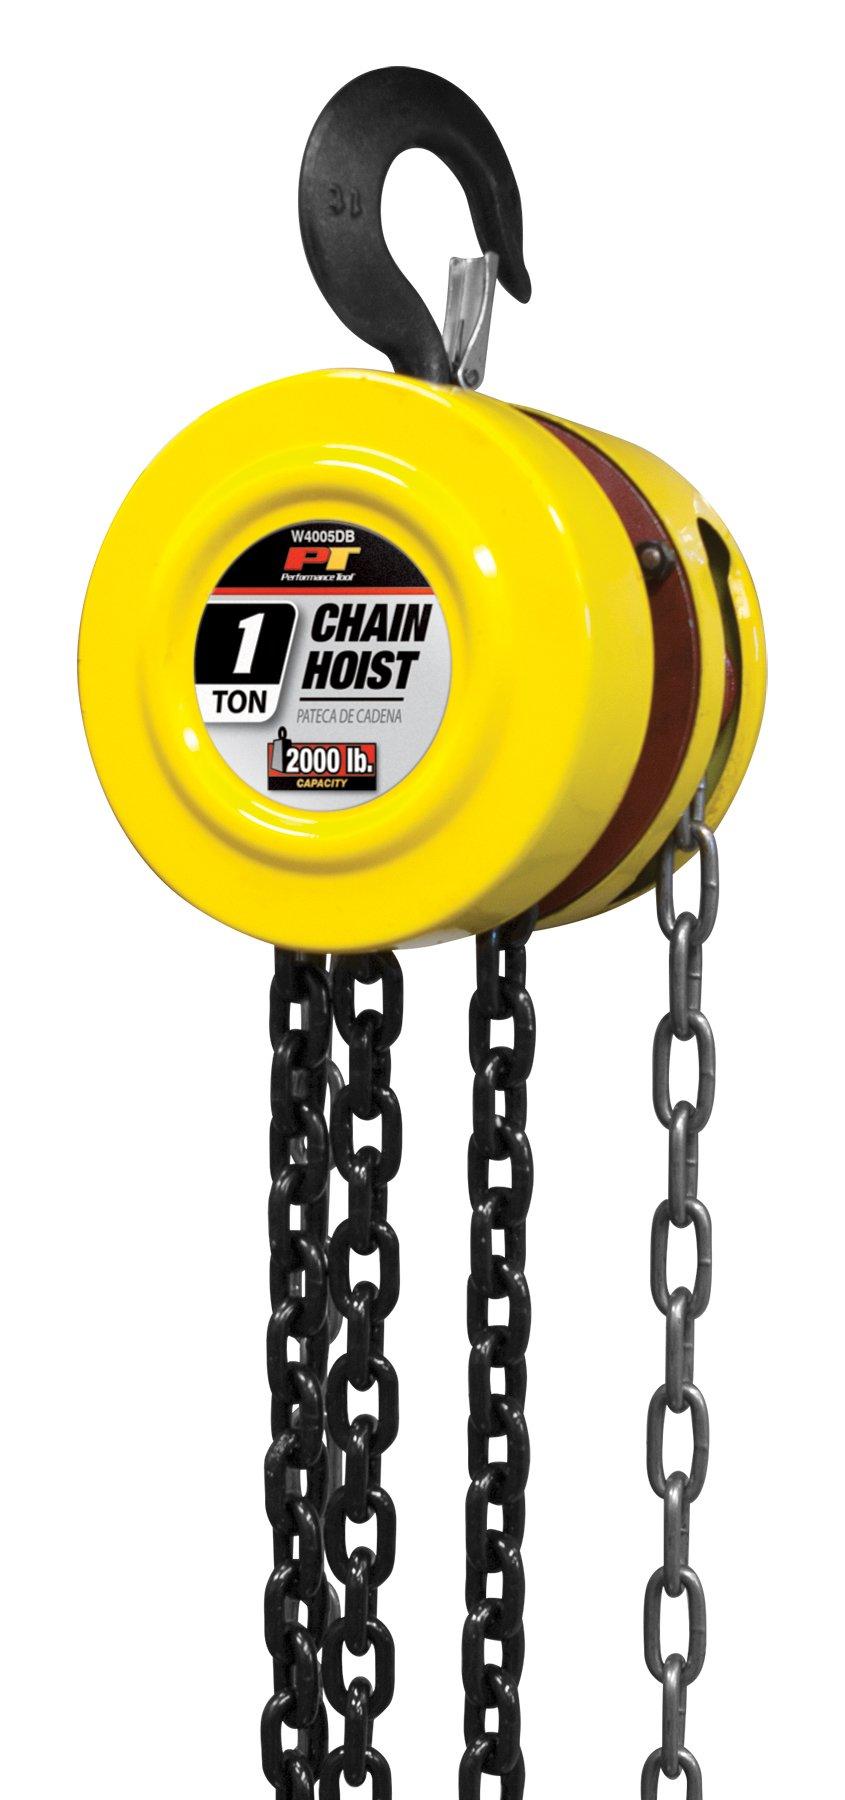 Performance Tool W4005DB Manual Hoist with 2 Hooks, 1 Ton (2,000 lb) Capacity 8' Chain Hoist